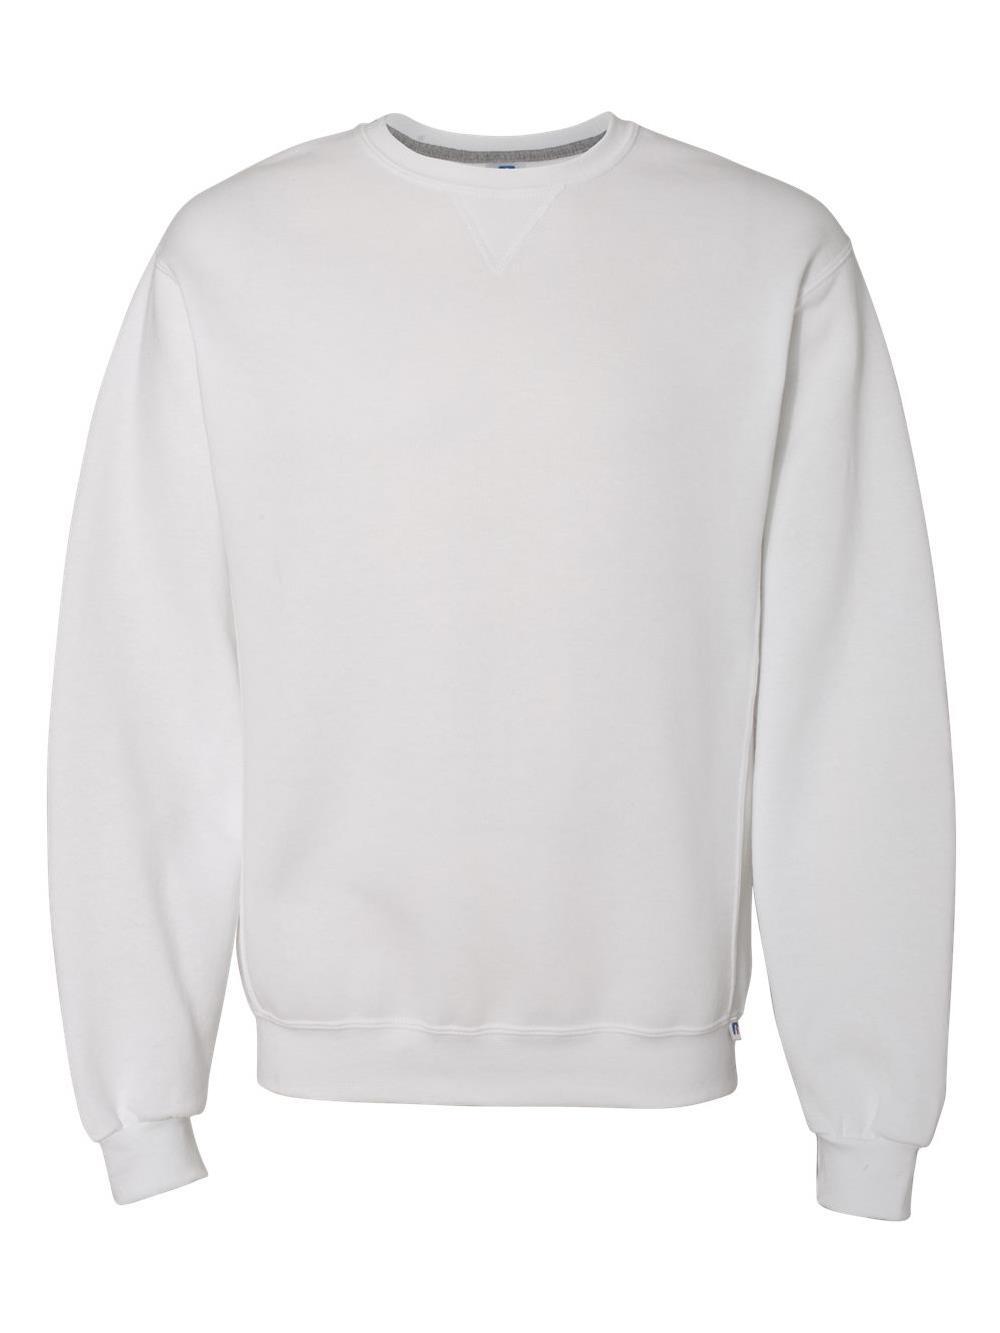 Russell Athletic Mens Dri-Power Fleece Crewneck T-Shirt